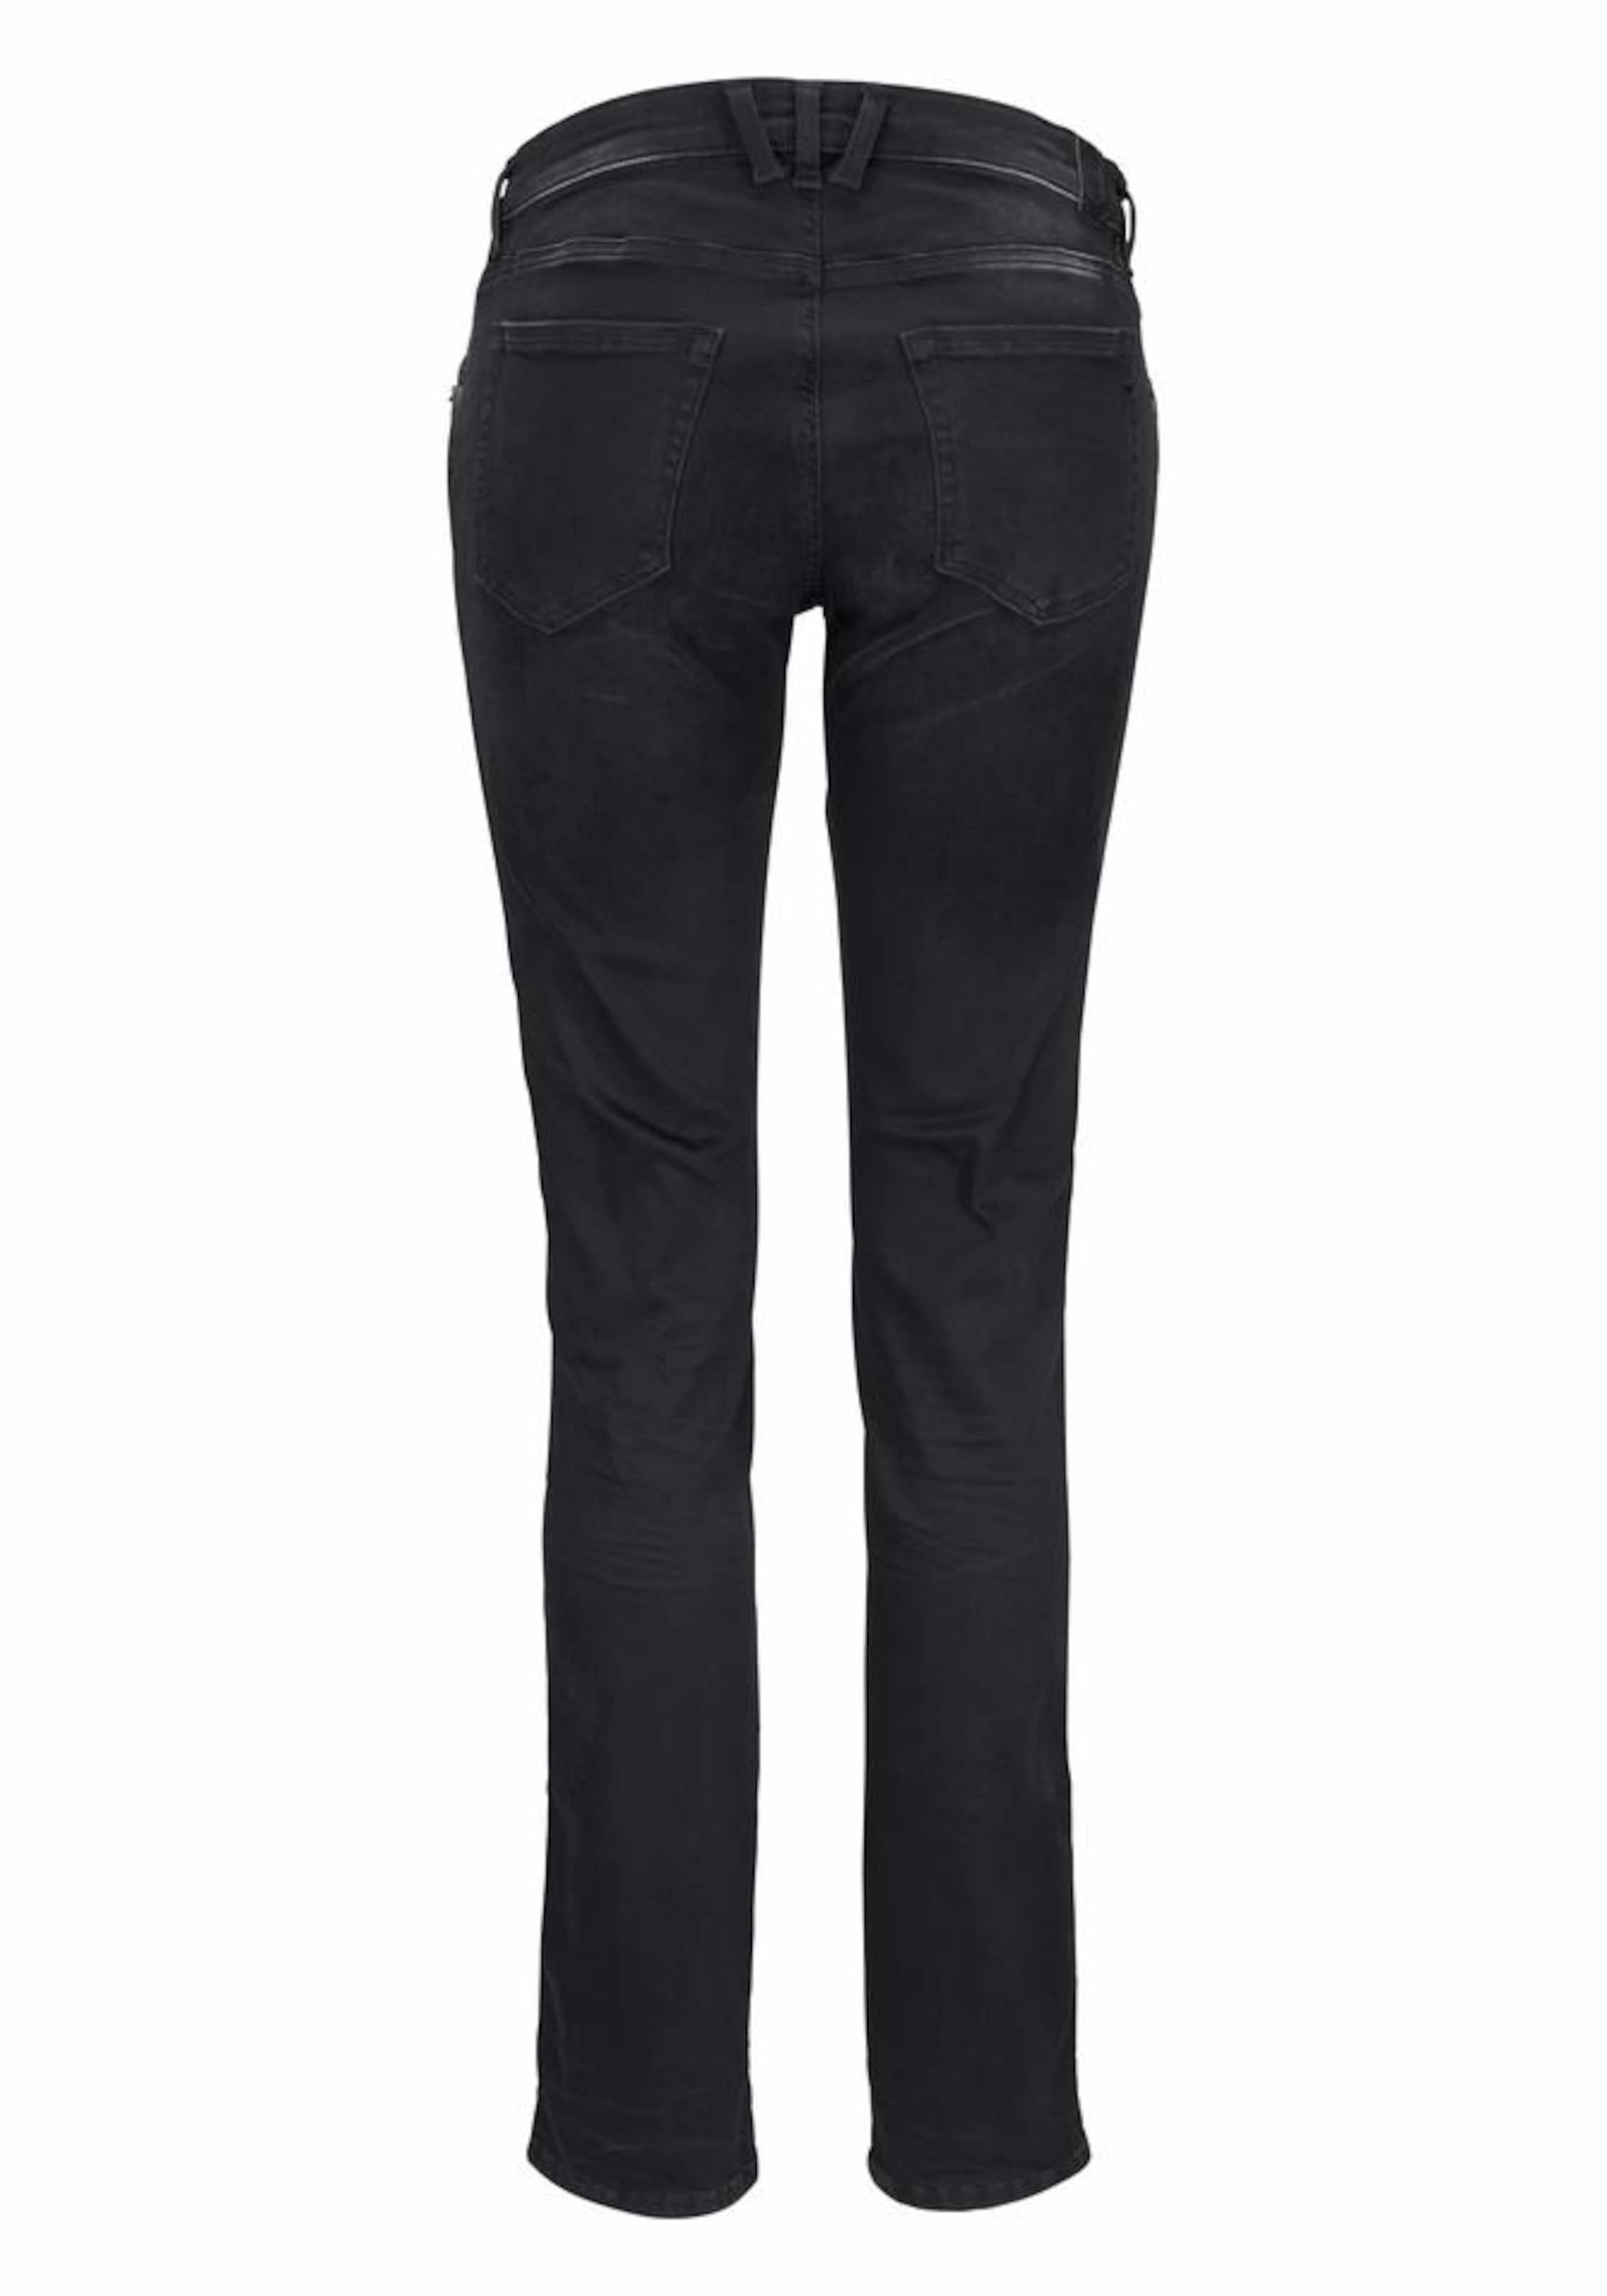 Jeans Denim Replay In 'katewin' Black 8wNm0Ovn